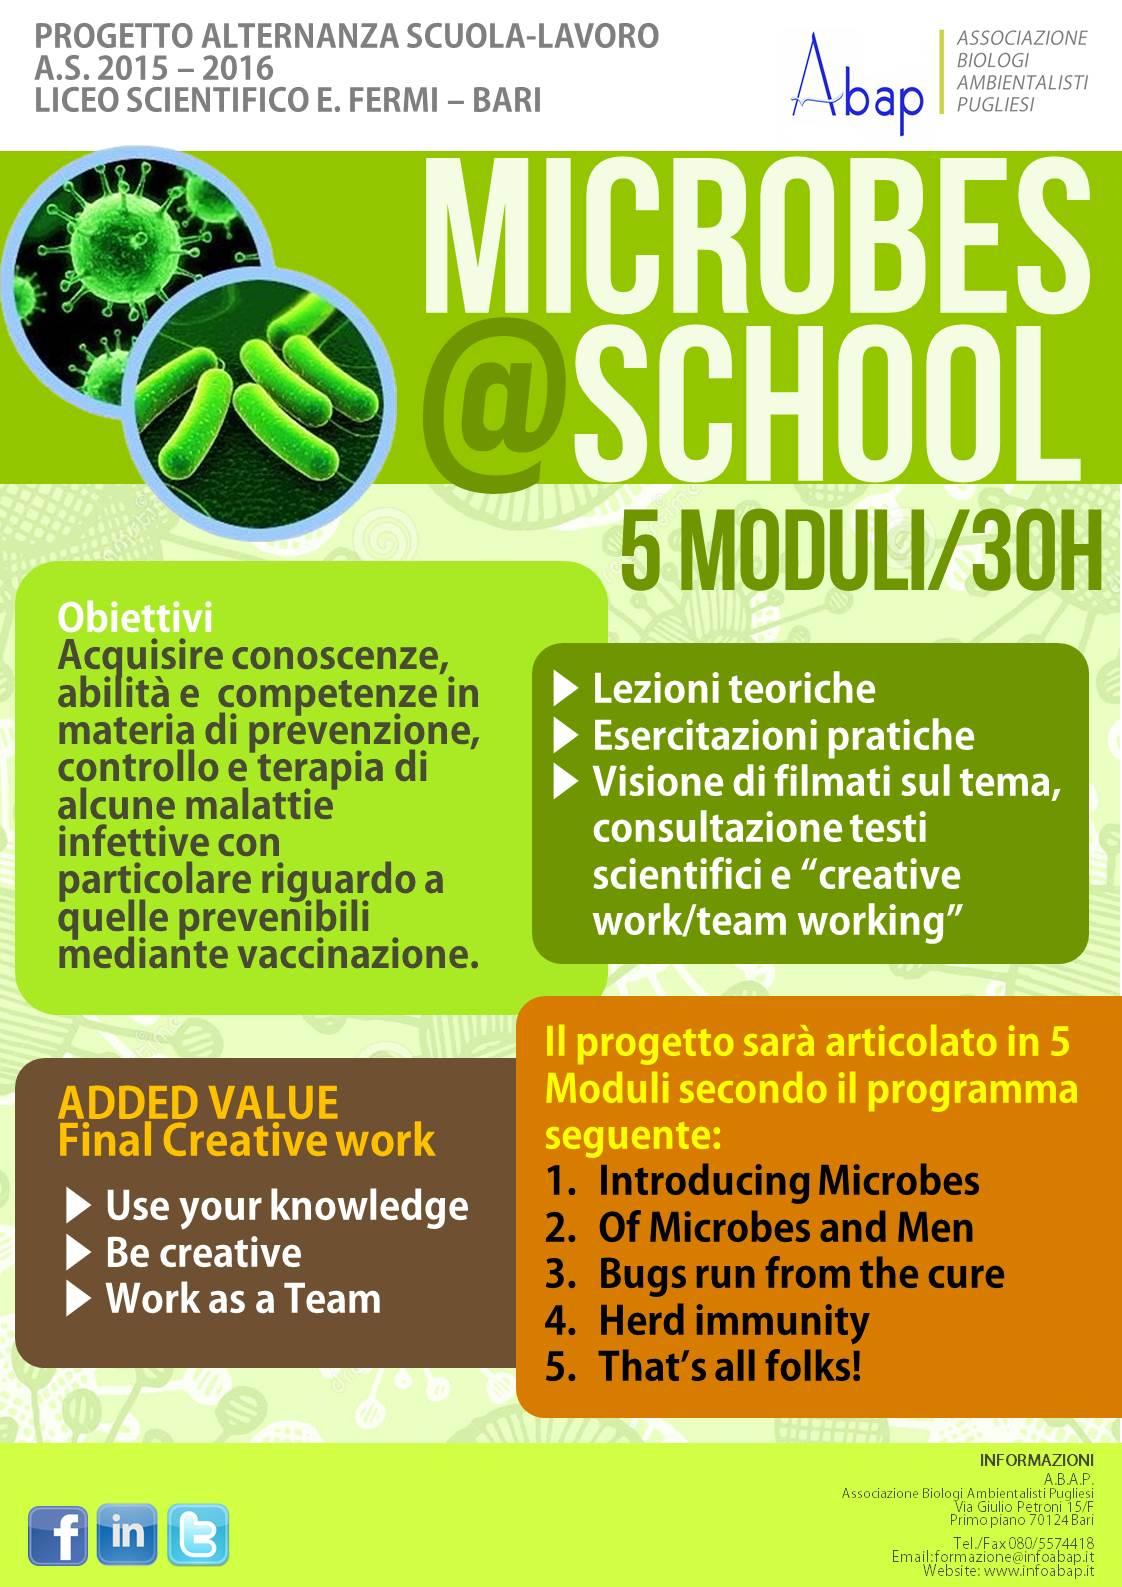 Microbes@School_locandina_ABAP